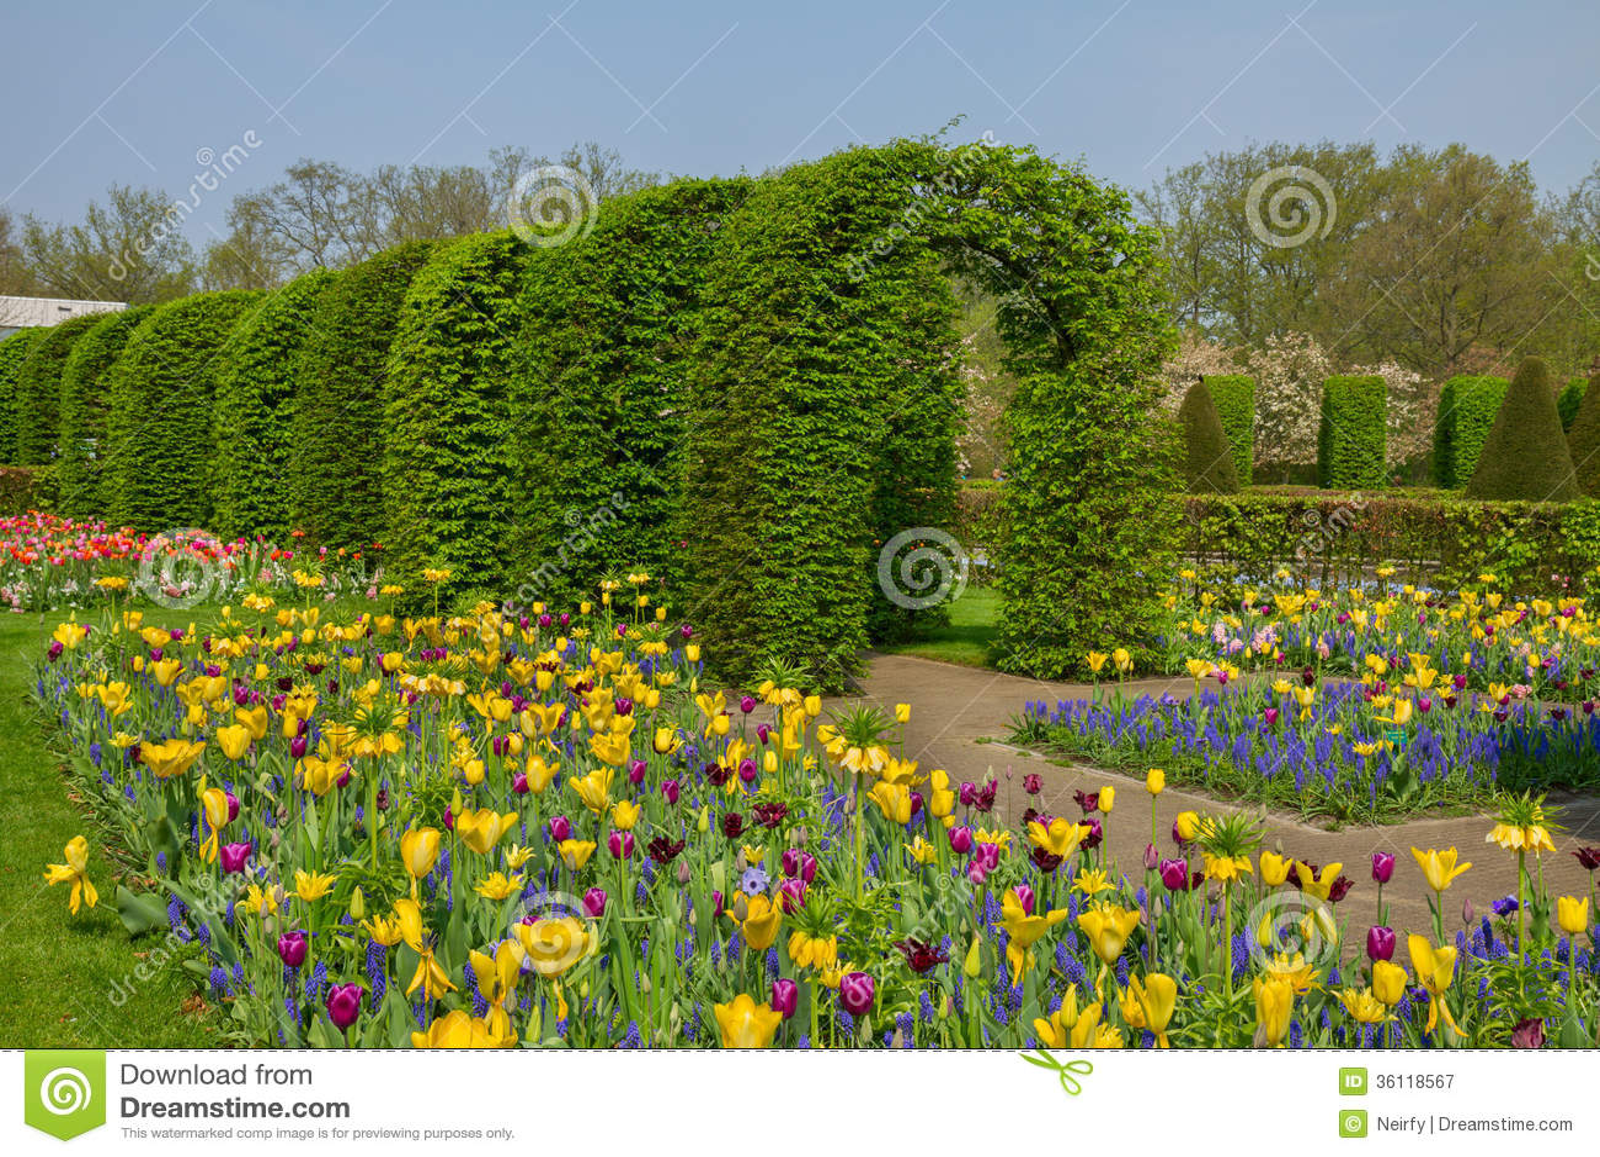 Keukenhof Garden At Sunny Day Netherlands Royalty Free